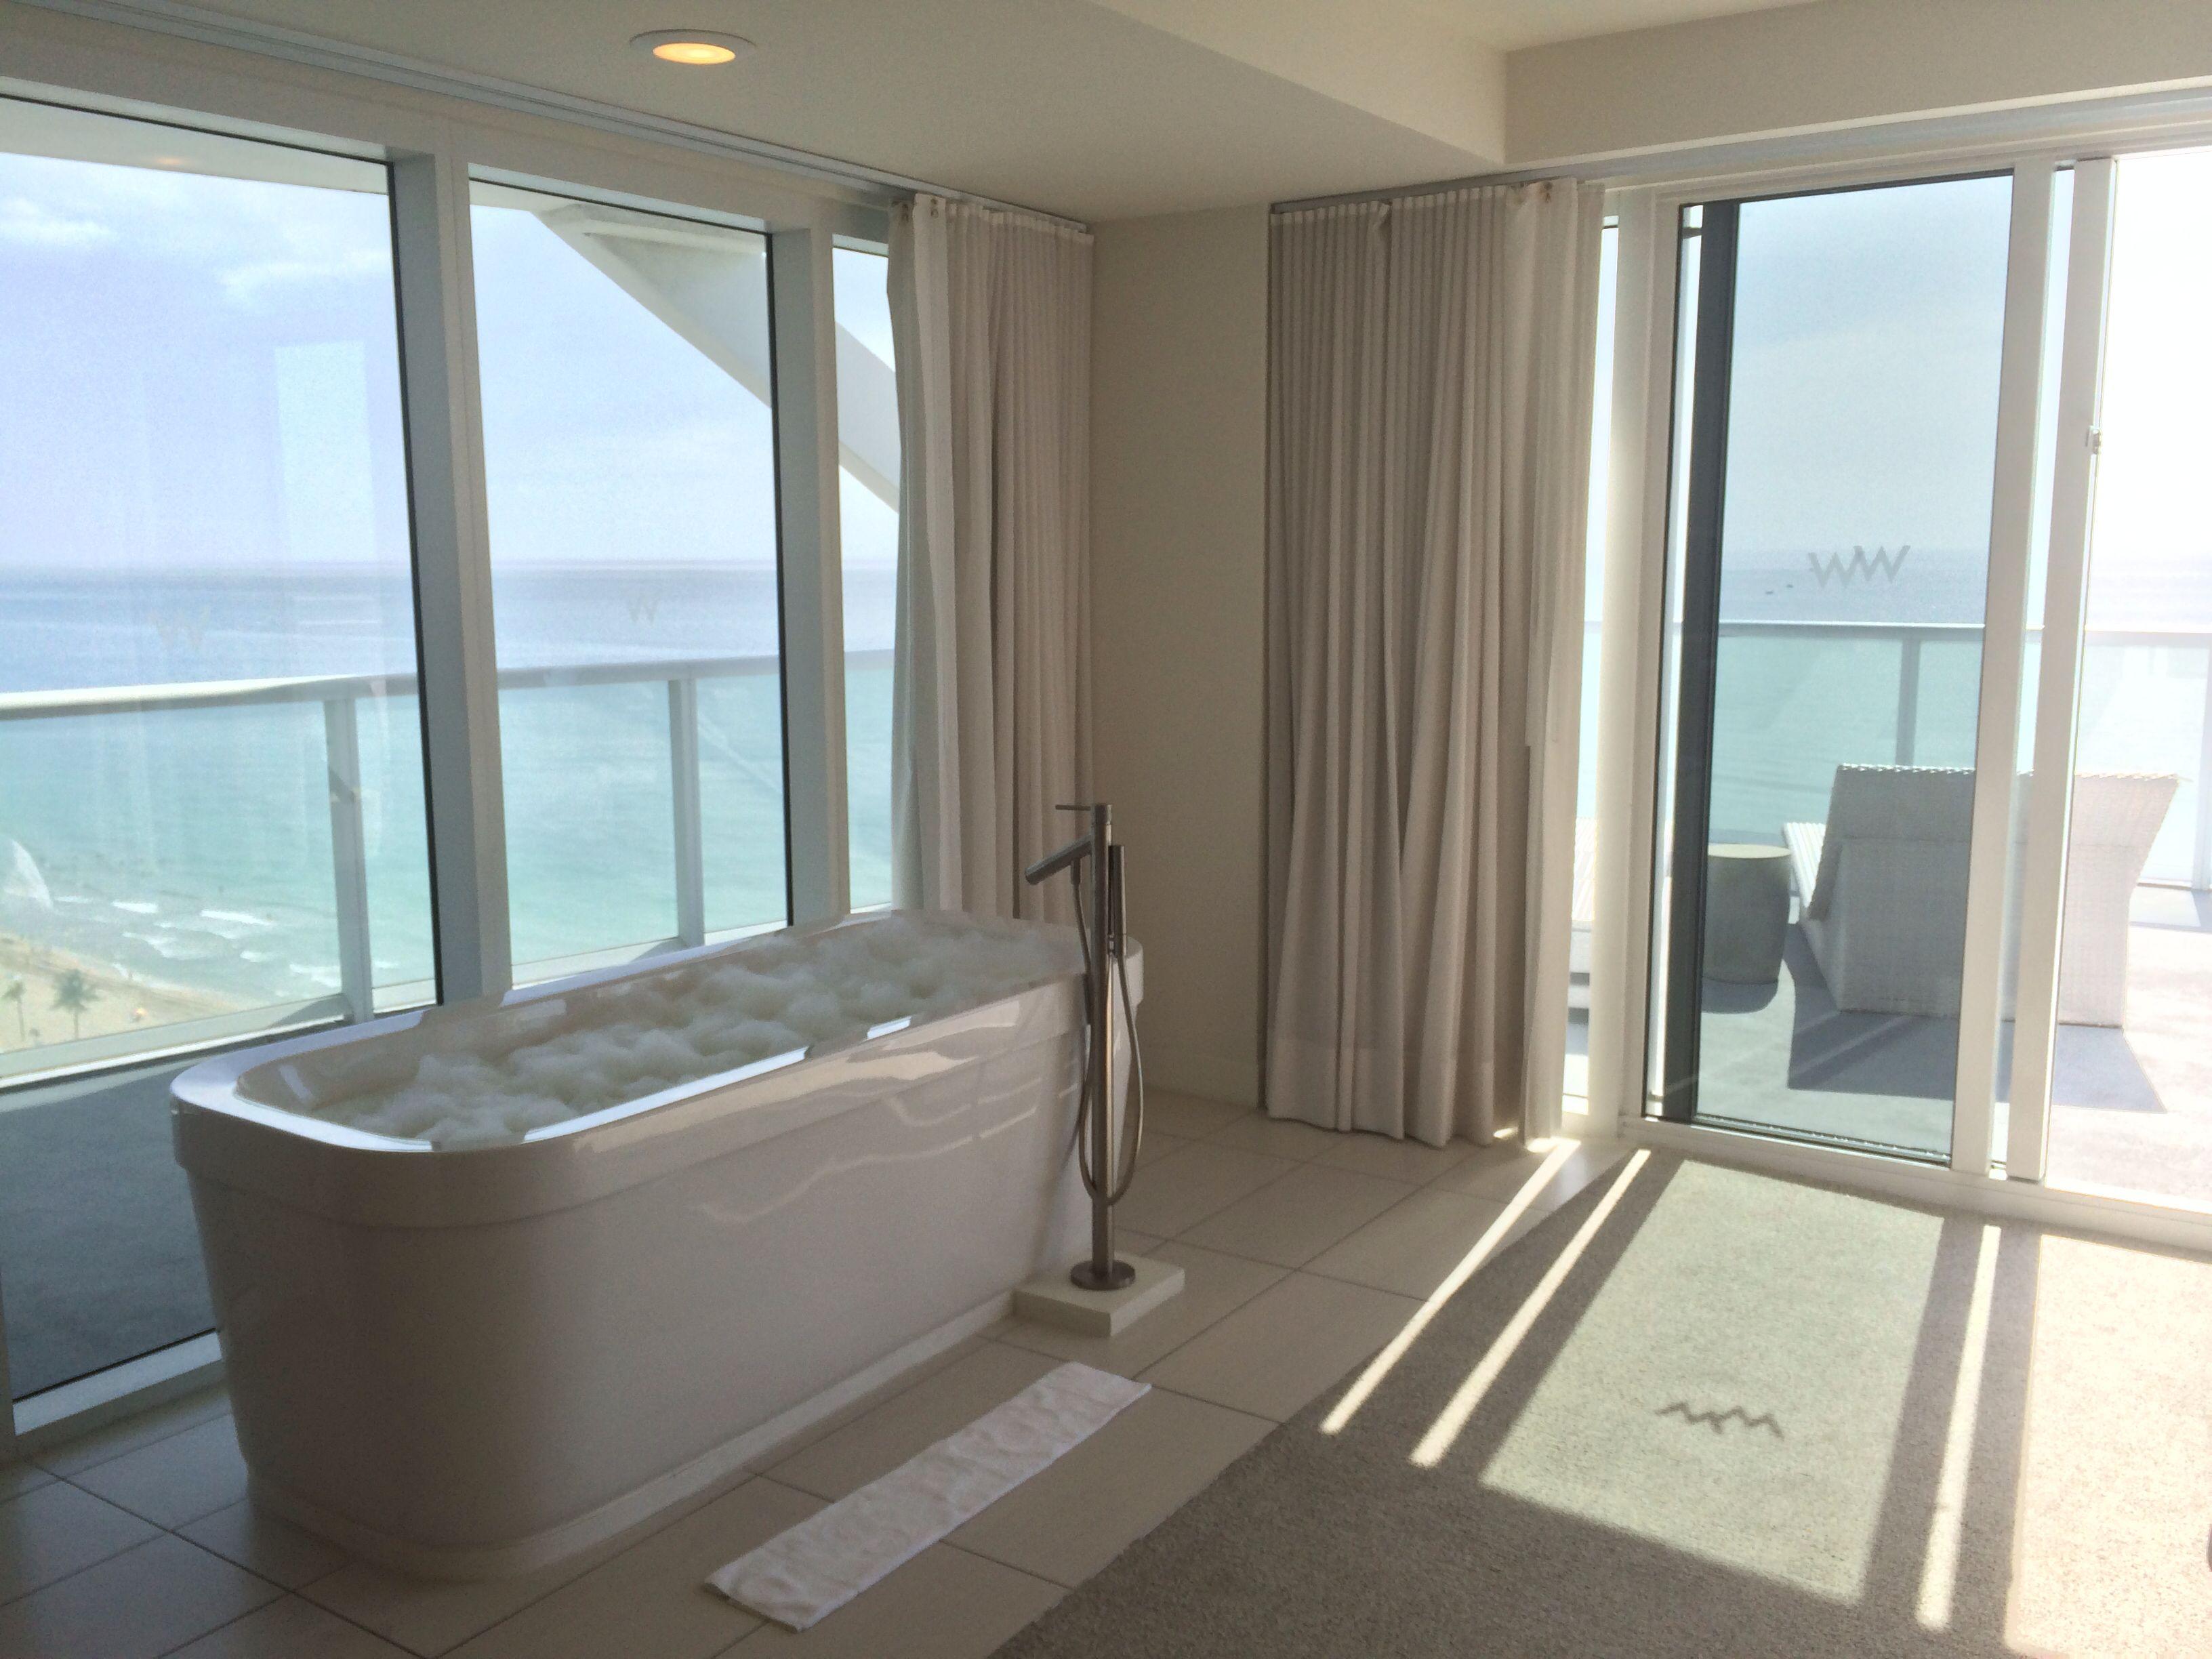 Oasis Suite Bathtub Fort Lauderdale Hotels Fort Lauderdale W Fort Lauderdale